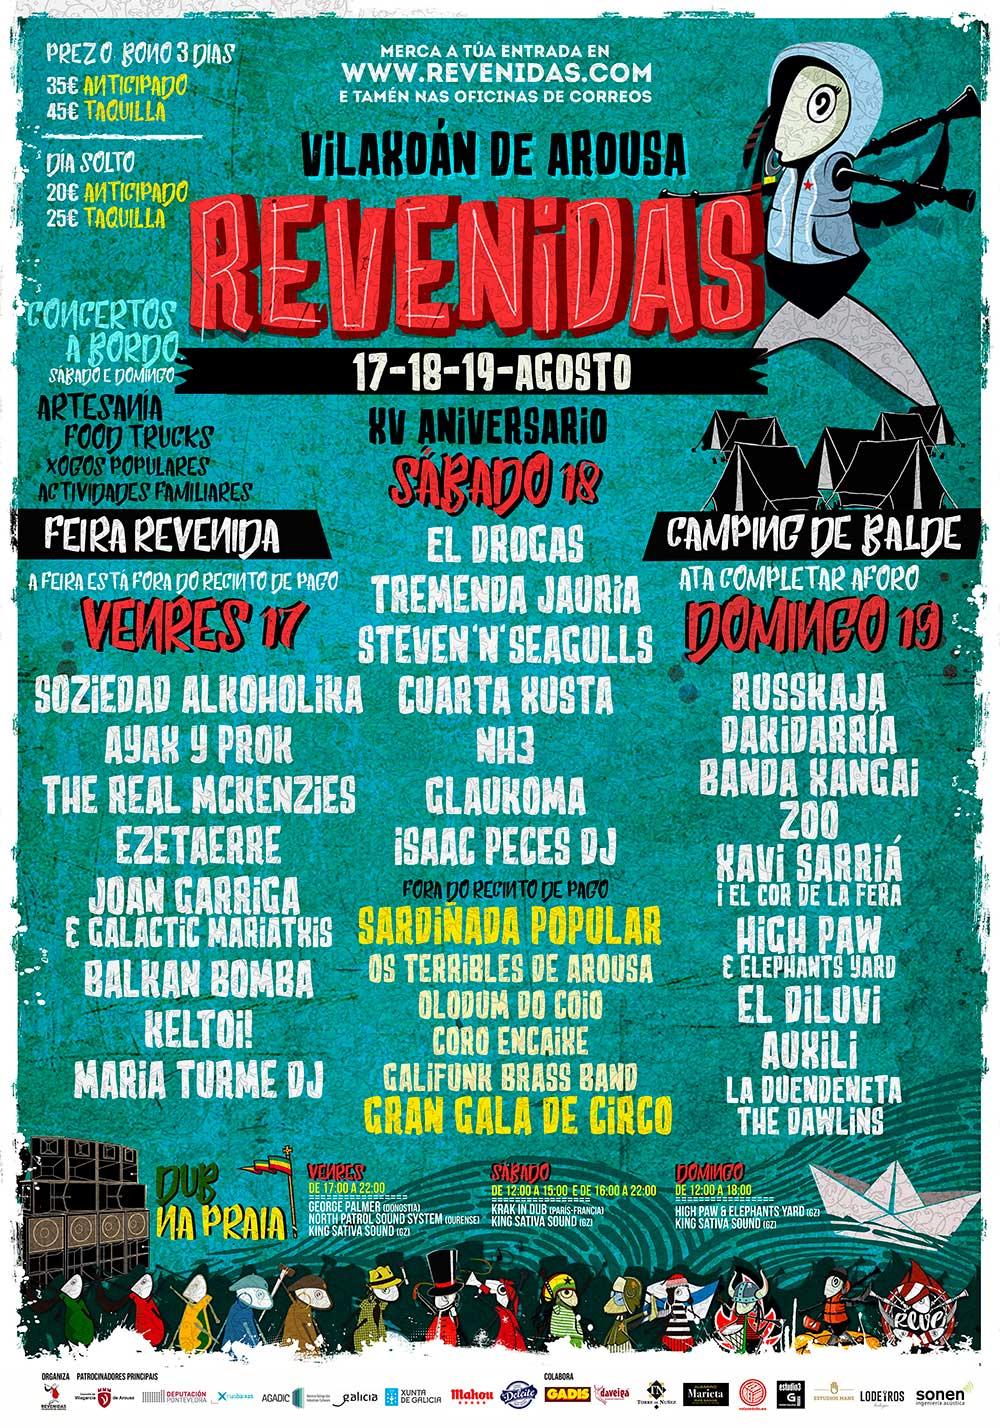 festival-revenidas-2018-5b6858be51365.jp